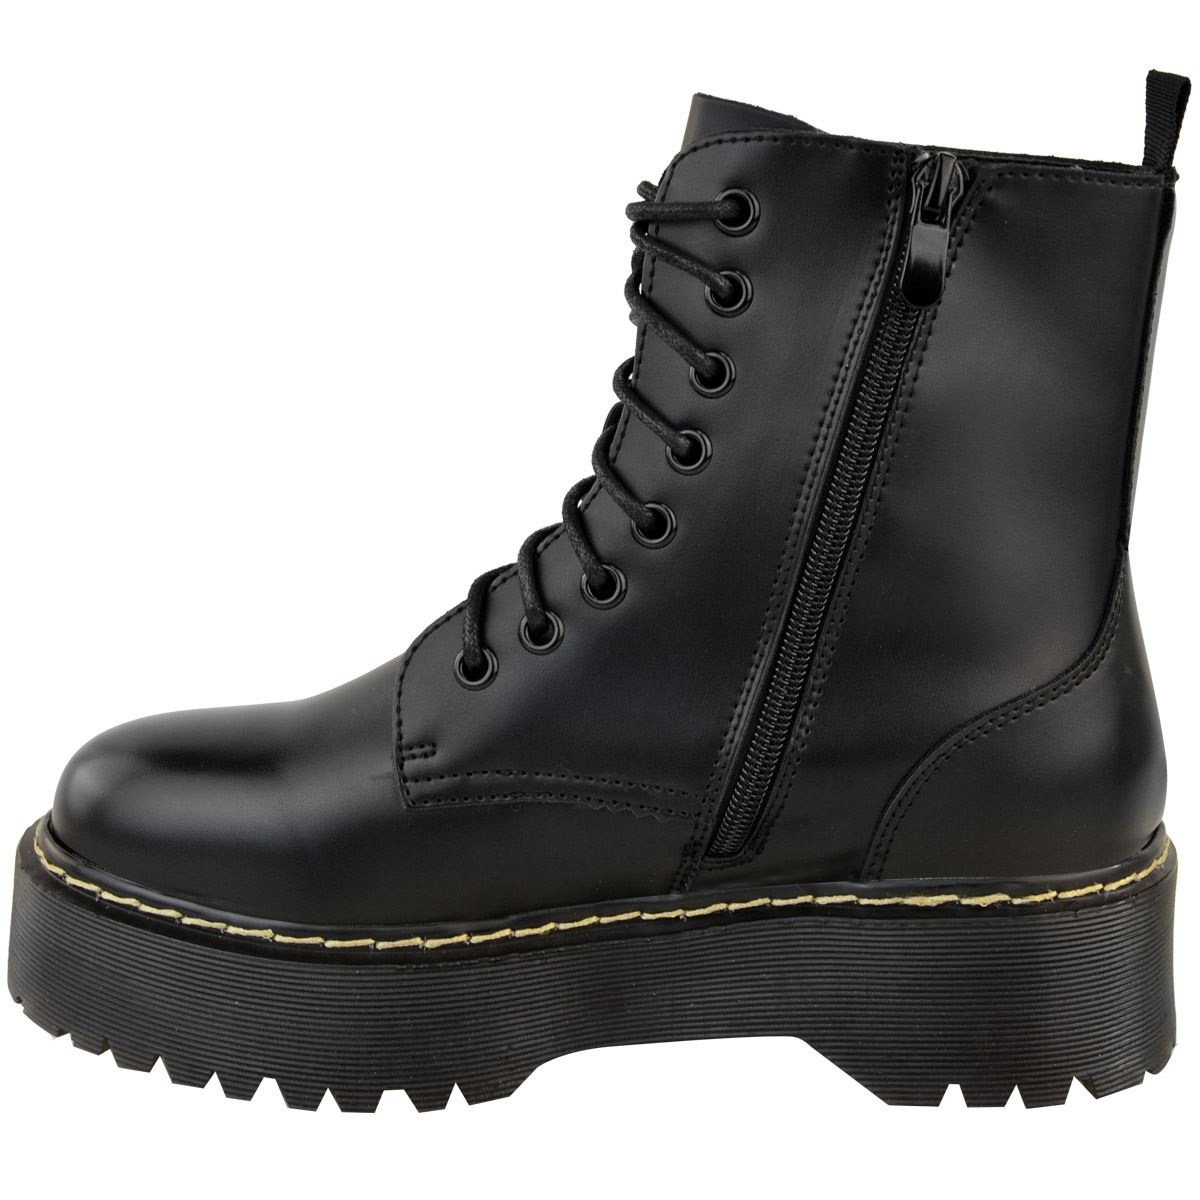 Womens-Ladies-Chunky-Lace-Up-Ankle-Boots-Platform-Icon-Retro-Goth-Punk-Black miniatuur 5